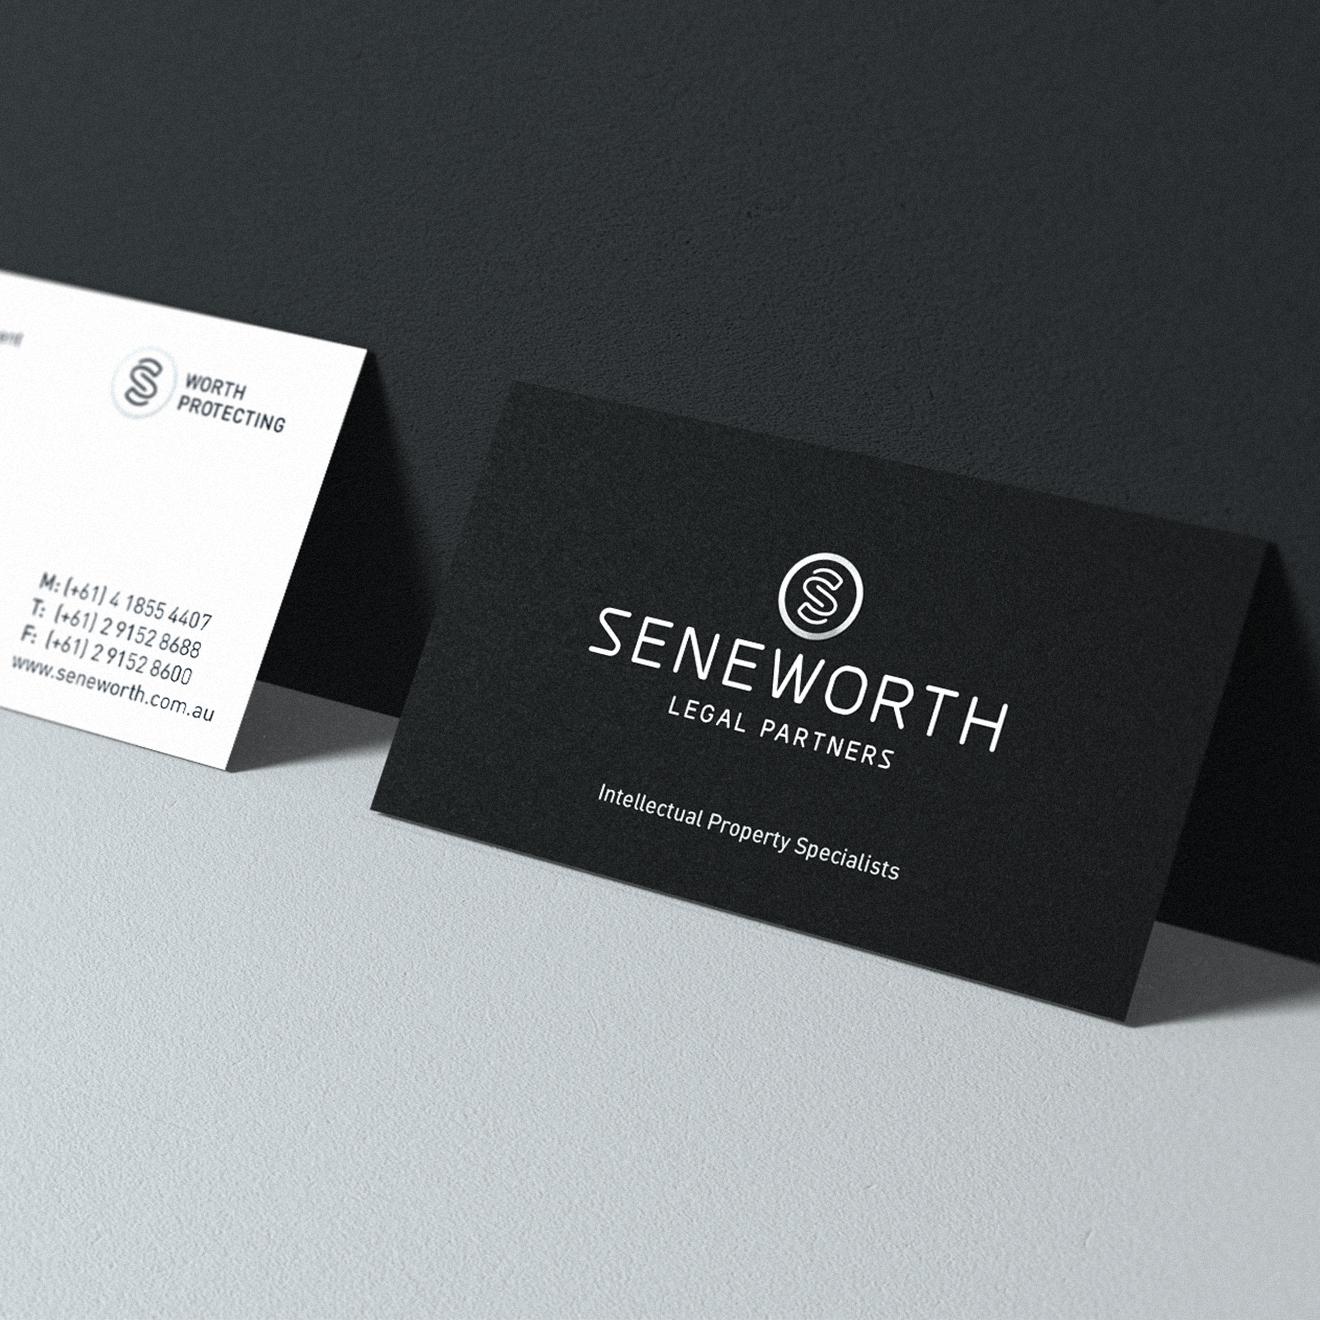 Seneworth - Business cards